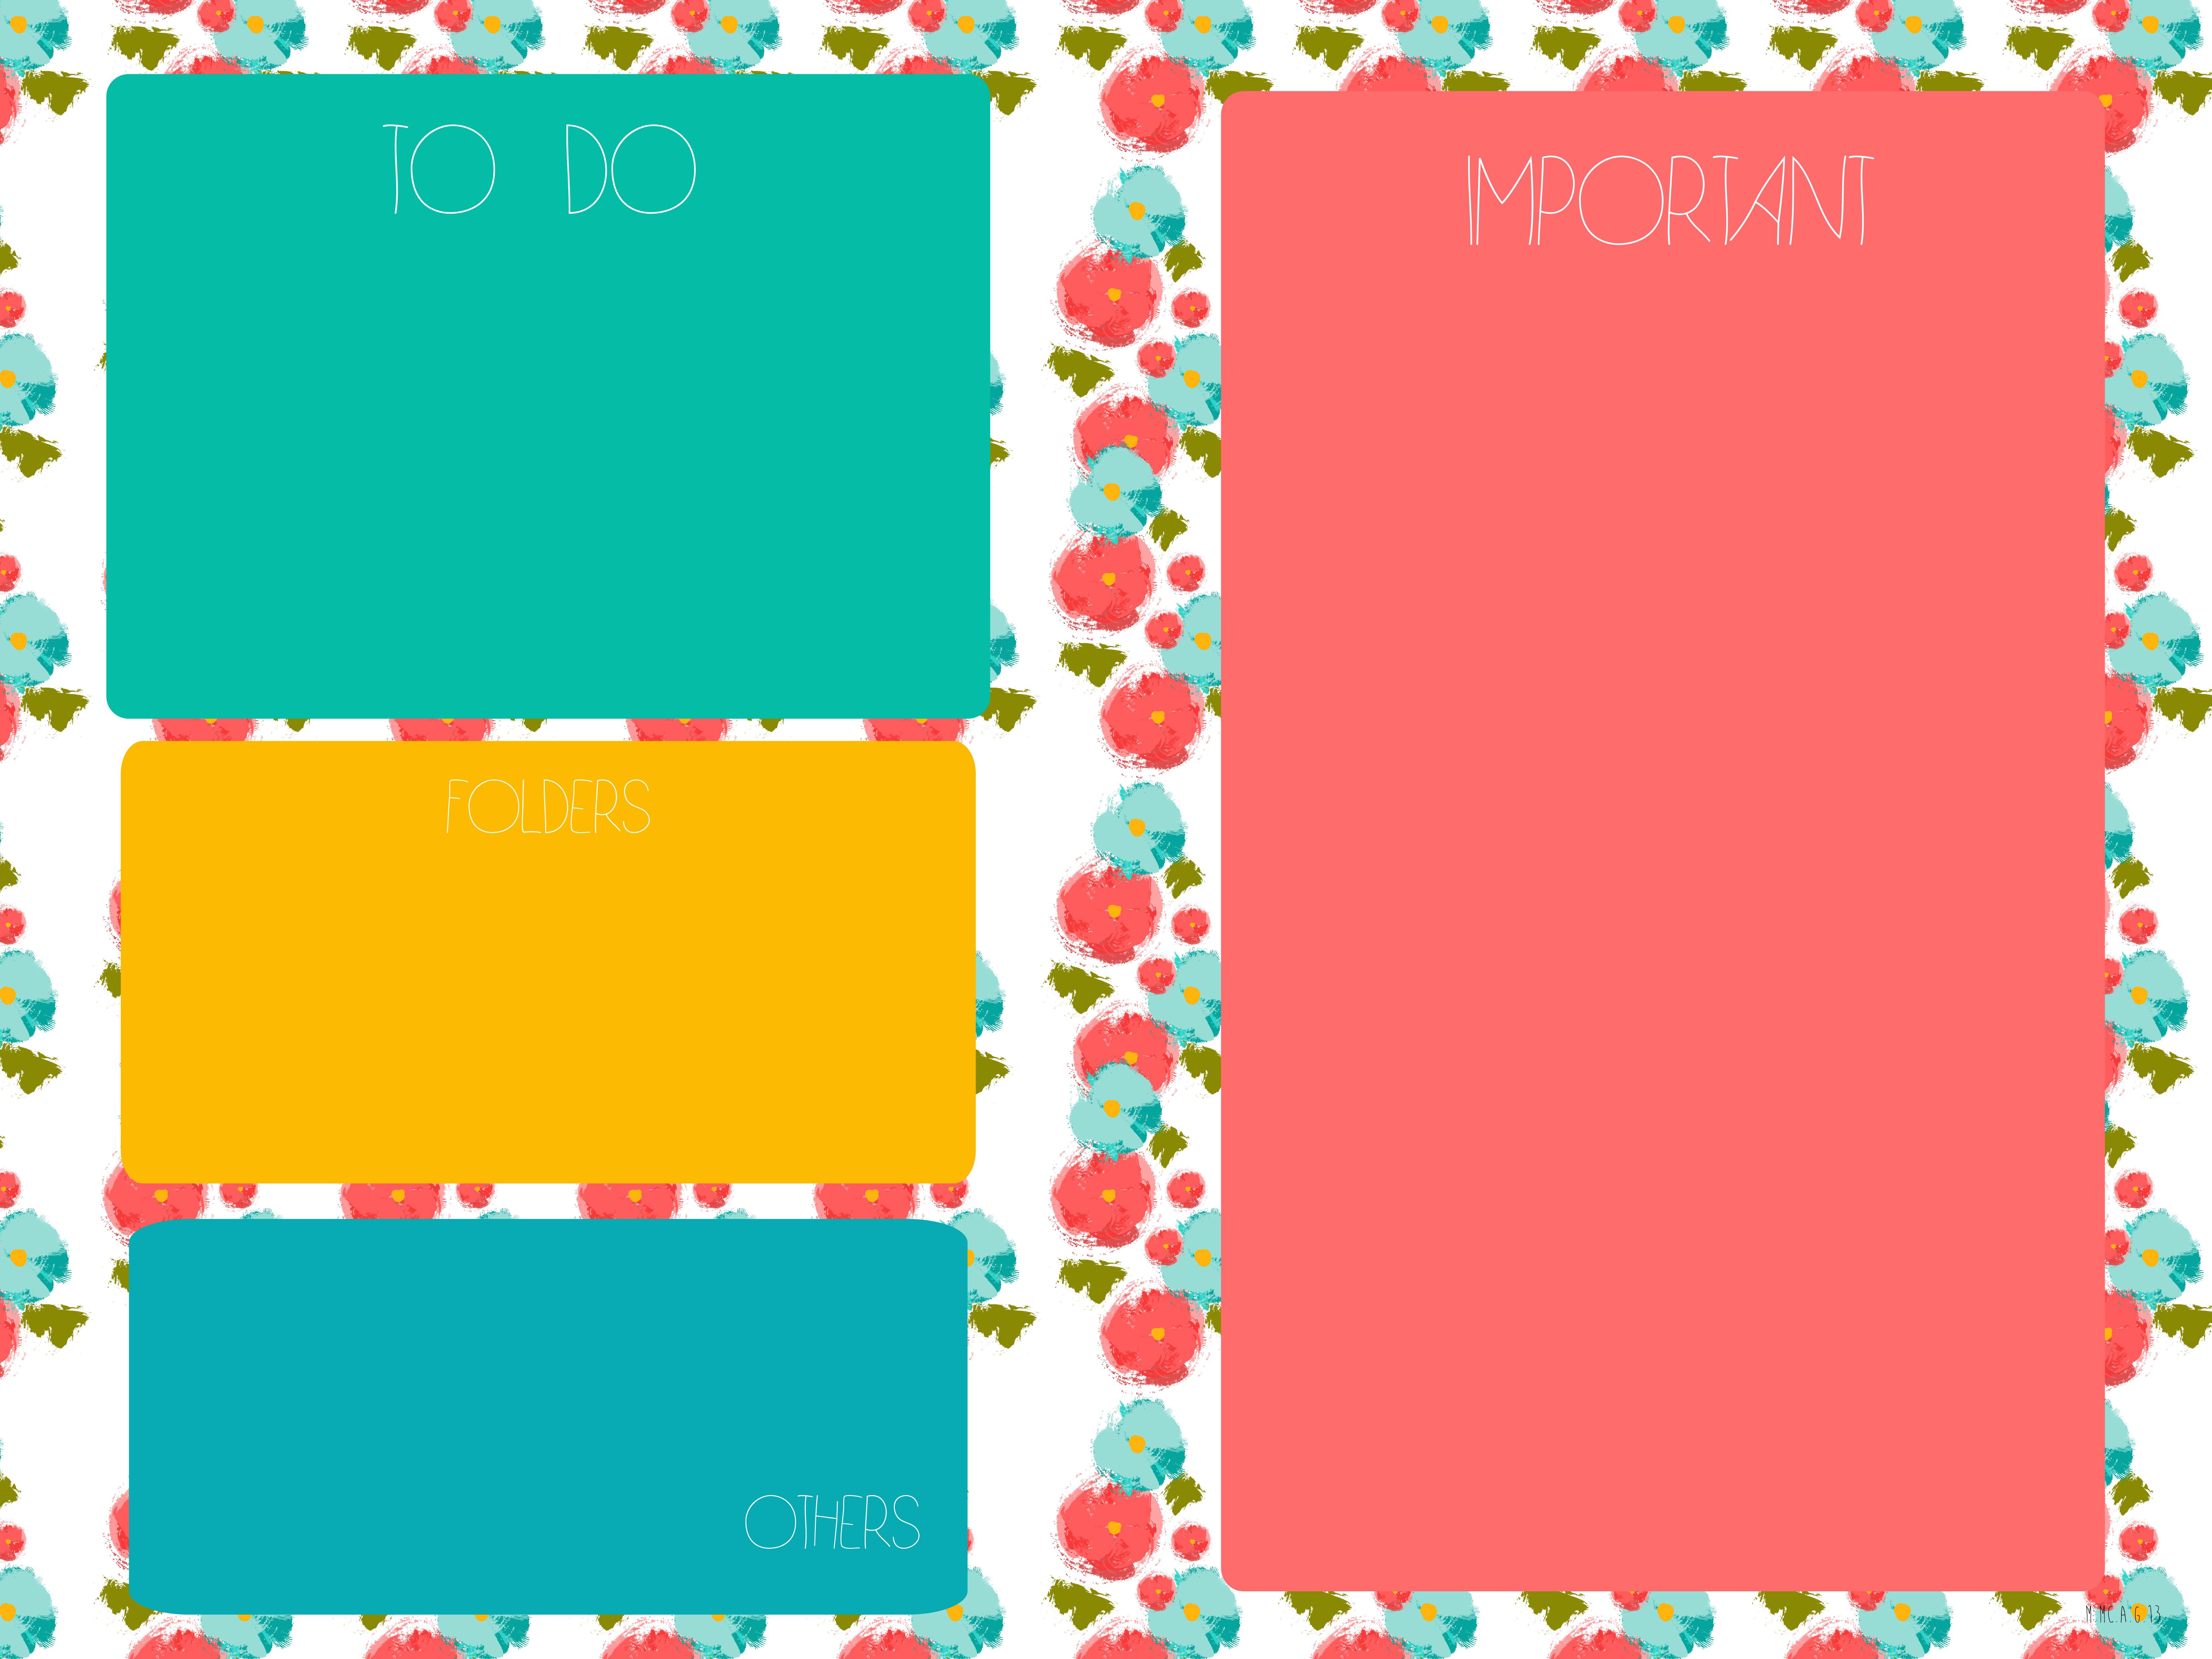 Wallpaper 01 Cute Desktop Wallpaper Icon Organizer 6667x5000 Wallpaper Teahub Io